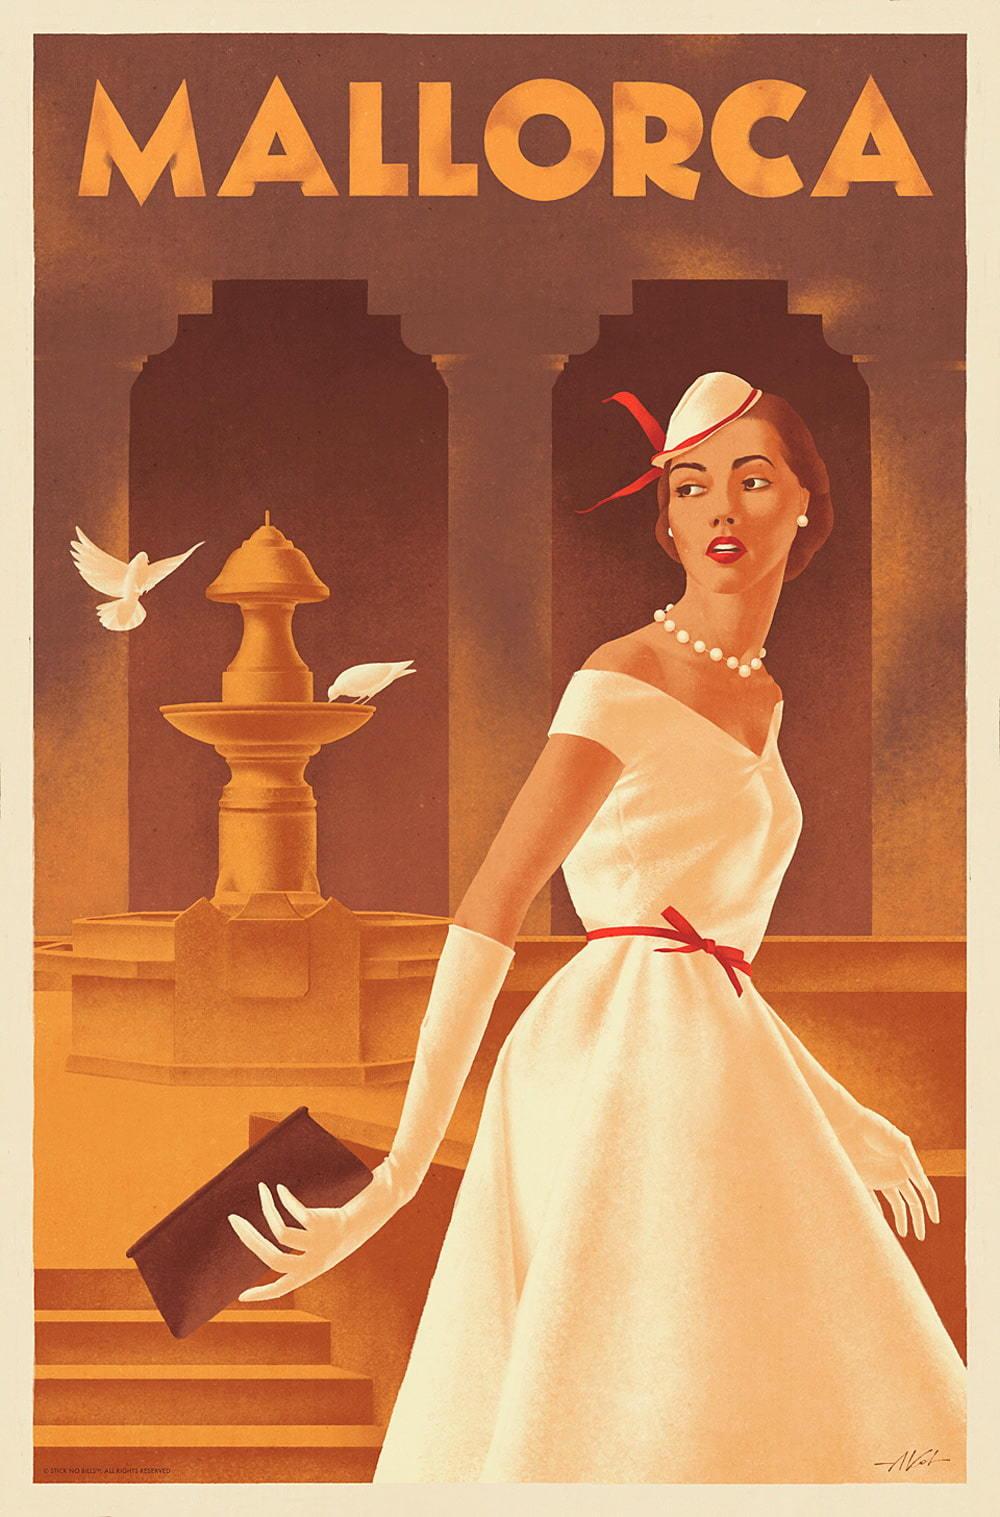 Mallorca Travel Posters III